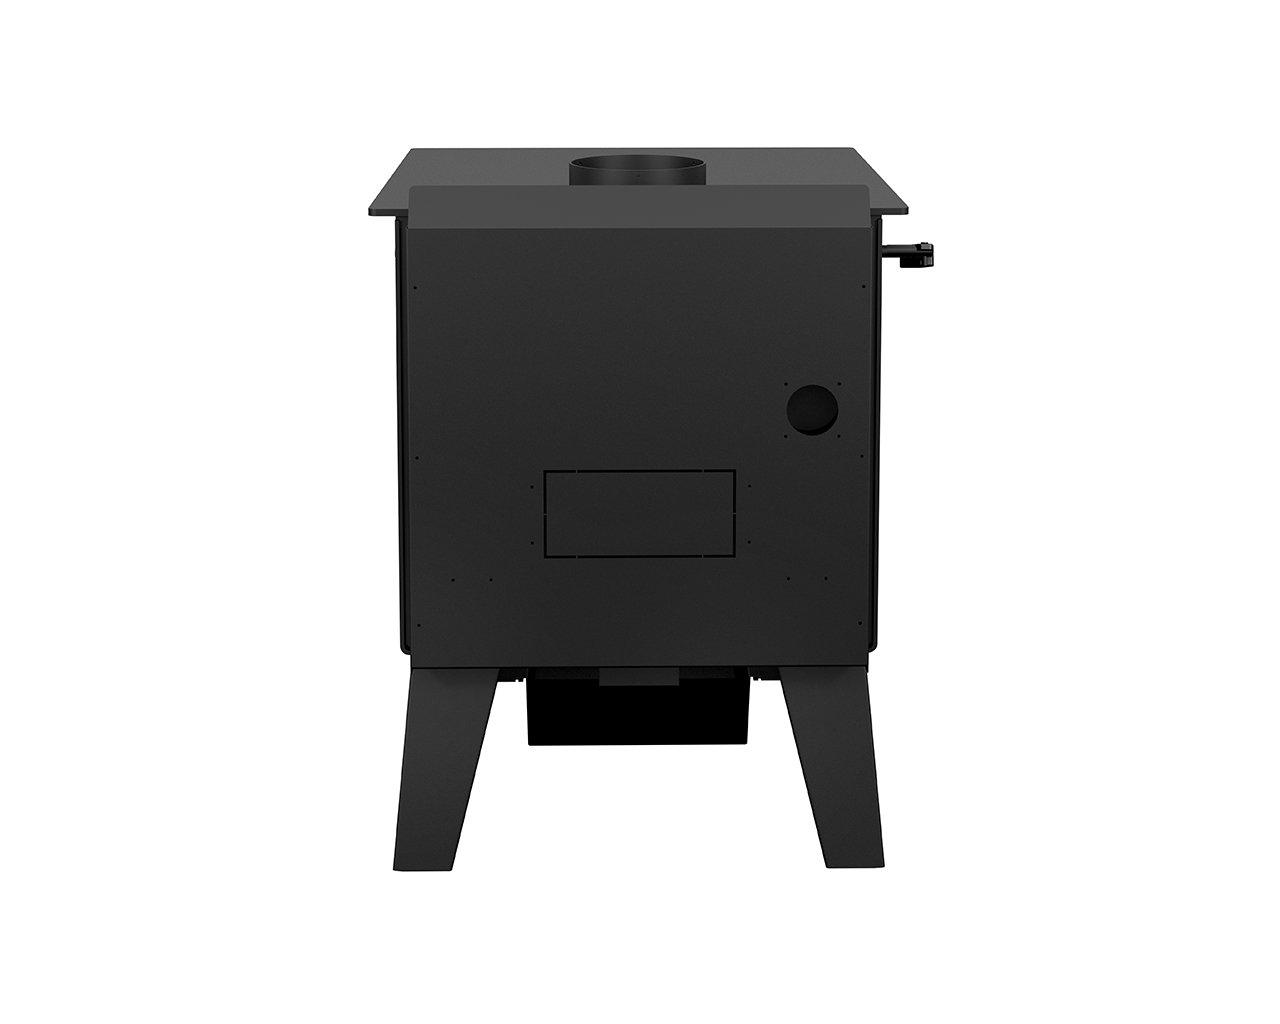 Drolet Black Stag High-Efficiency Wood Stove - 90,000 BTU, EPA Certified, Model Number DB03410 by Drolet